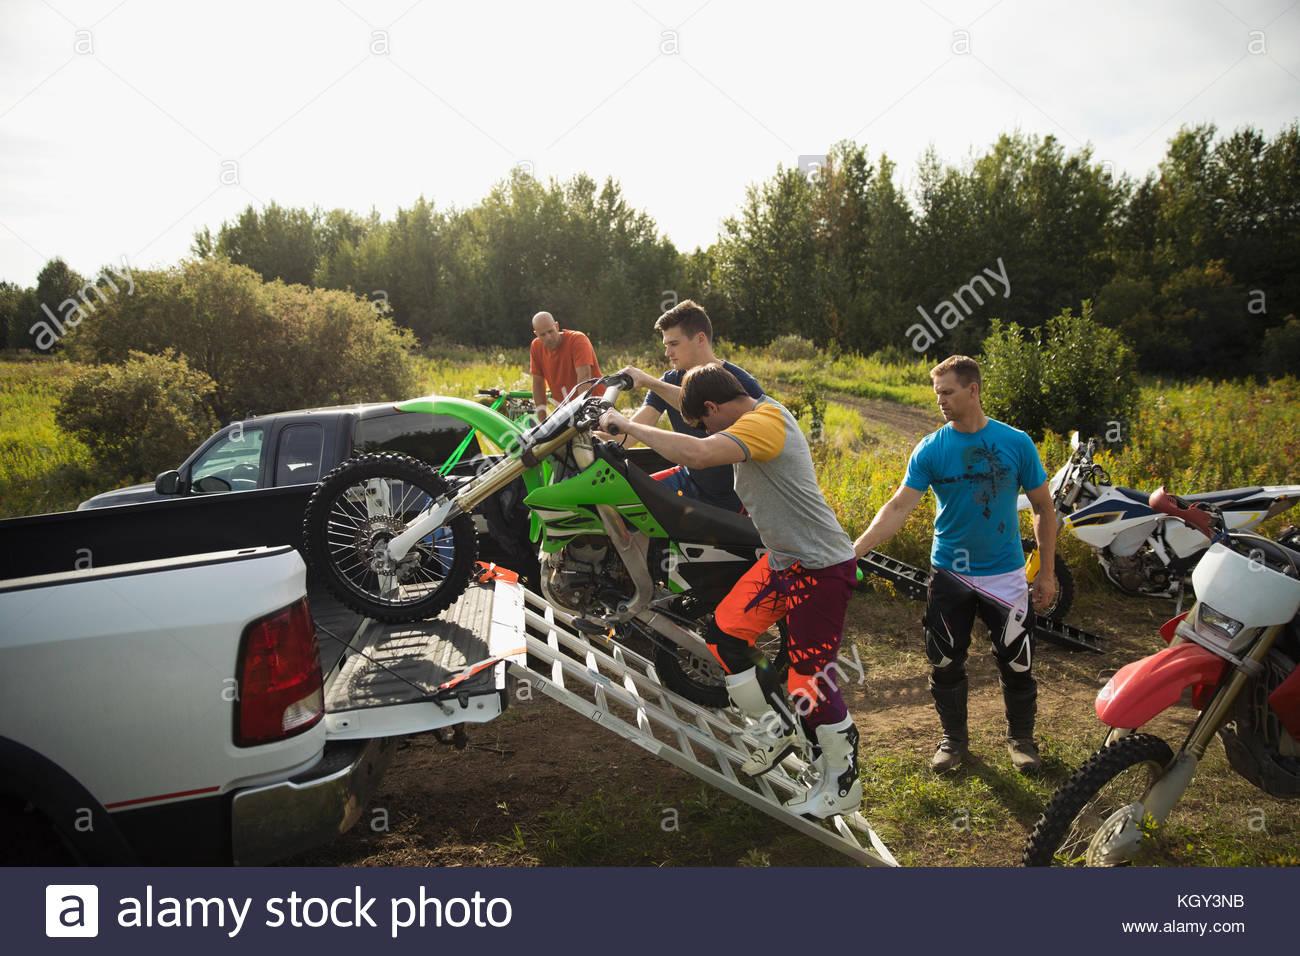 Men loading motorbikes onto truck - Stock Image